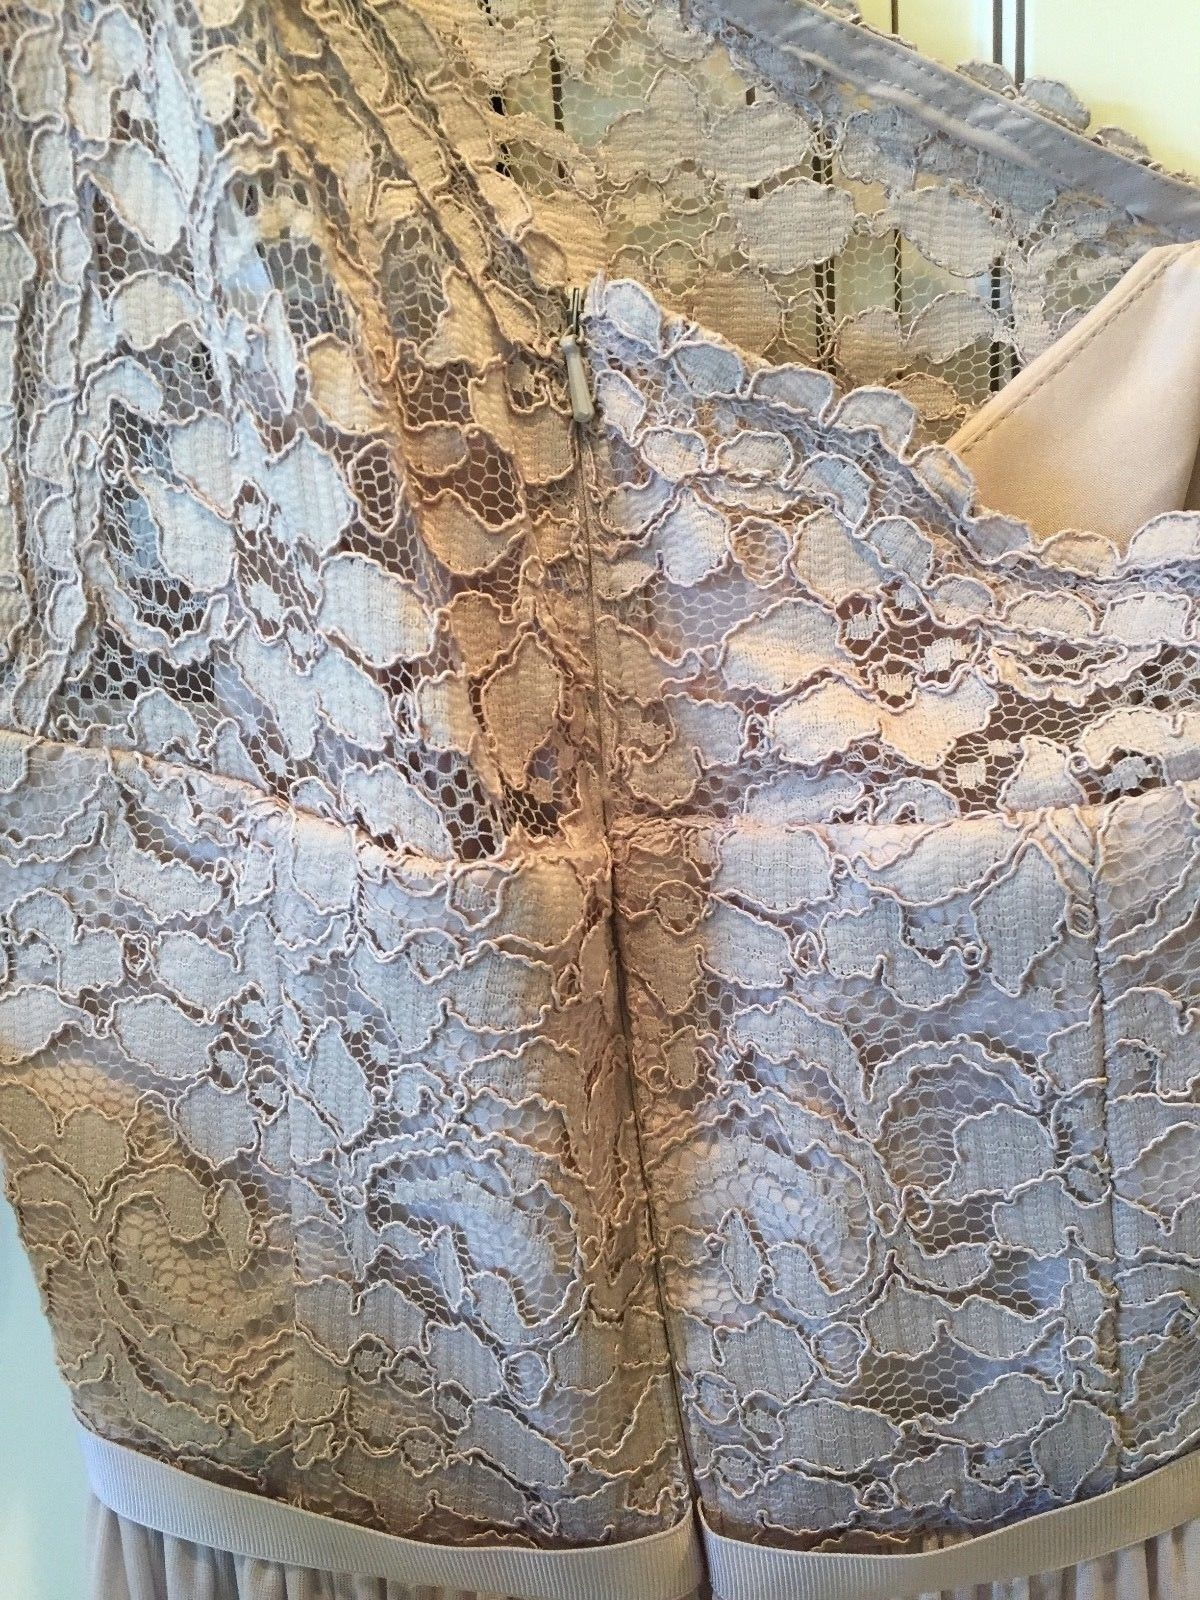 Women's Davids Bridal Biscotti Tan One Shoulder Lace Bridesmaid Dress Sz 2 w/Tag